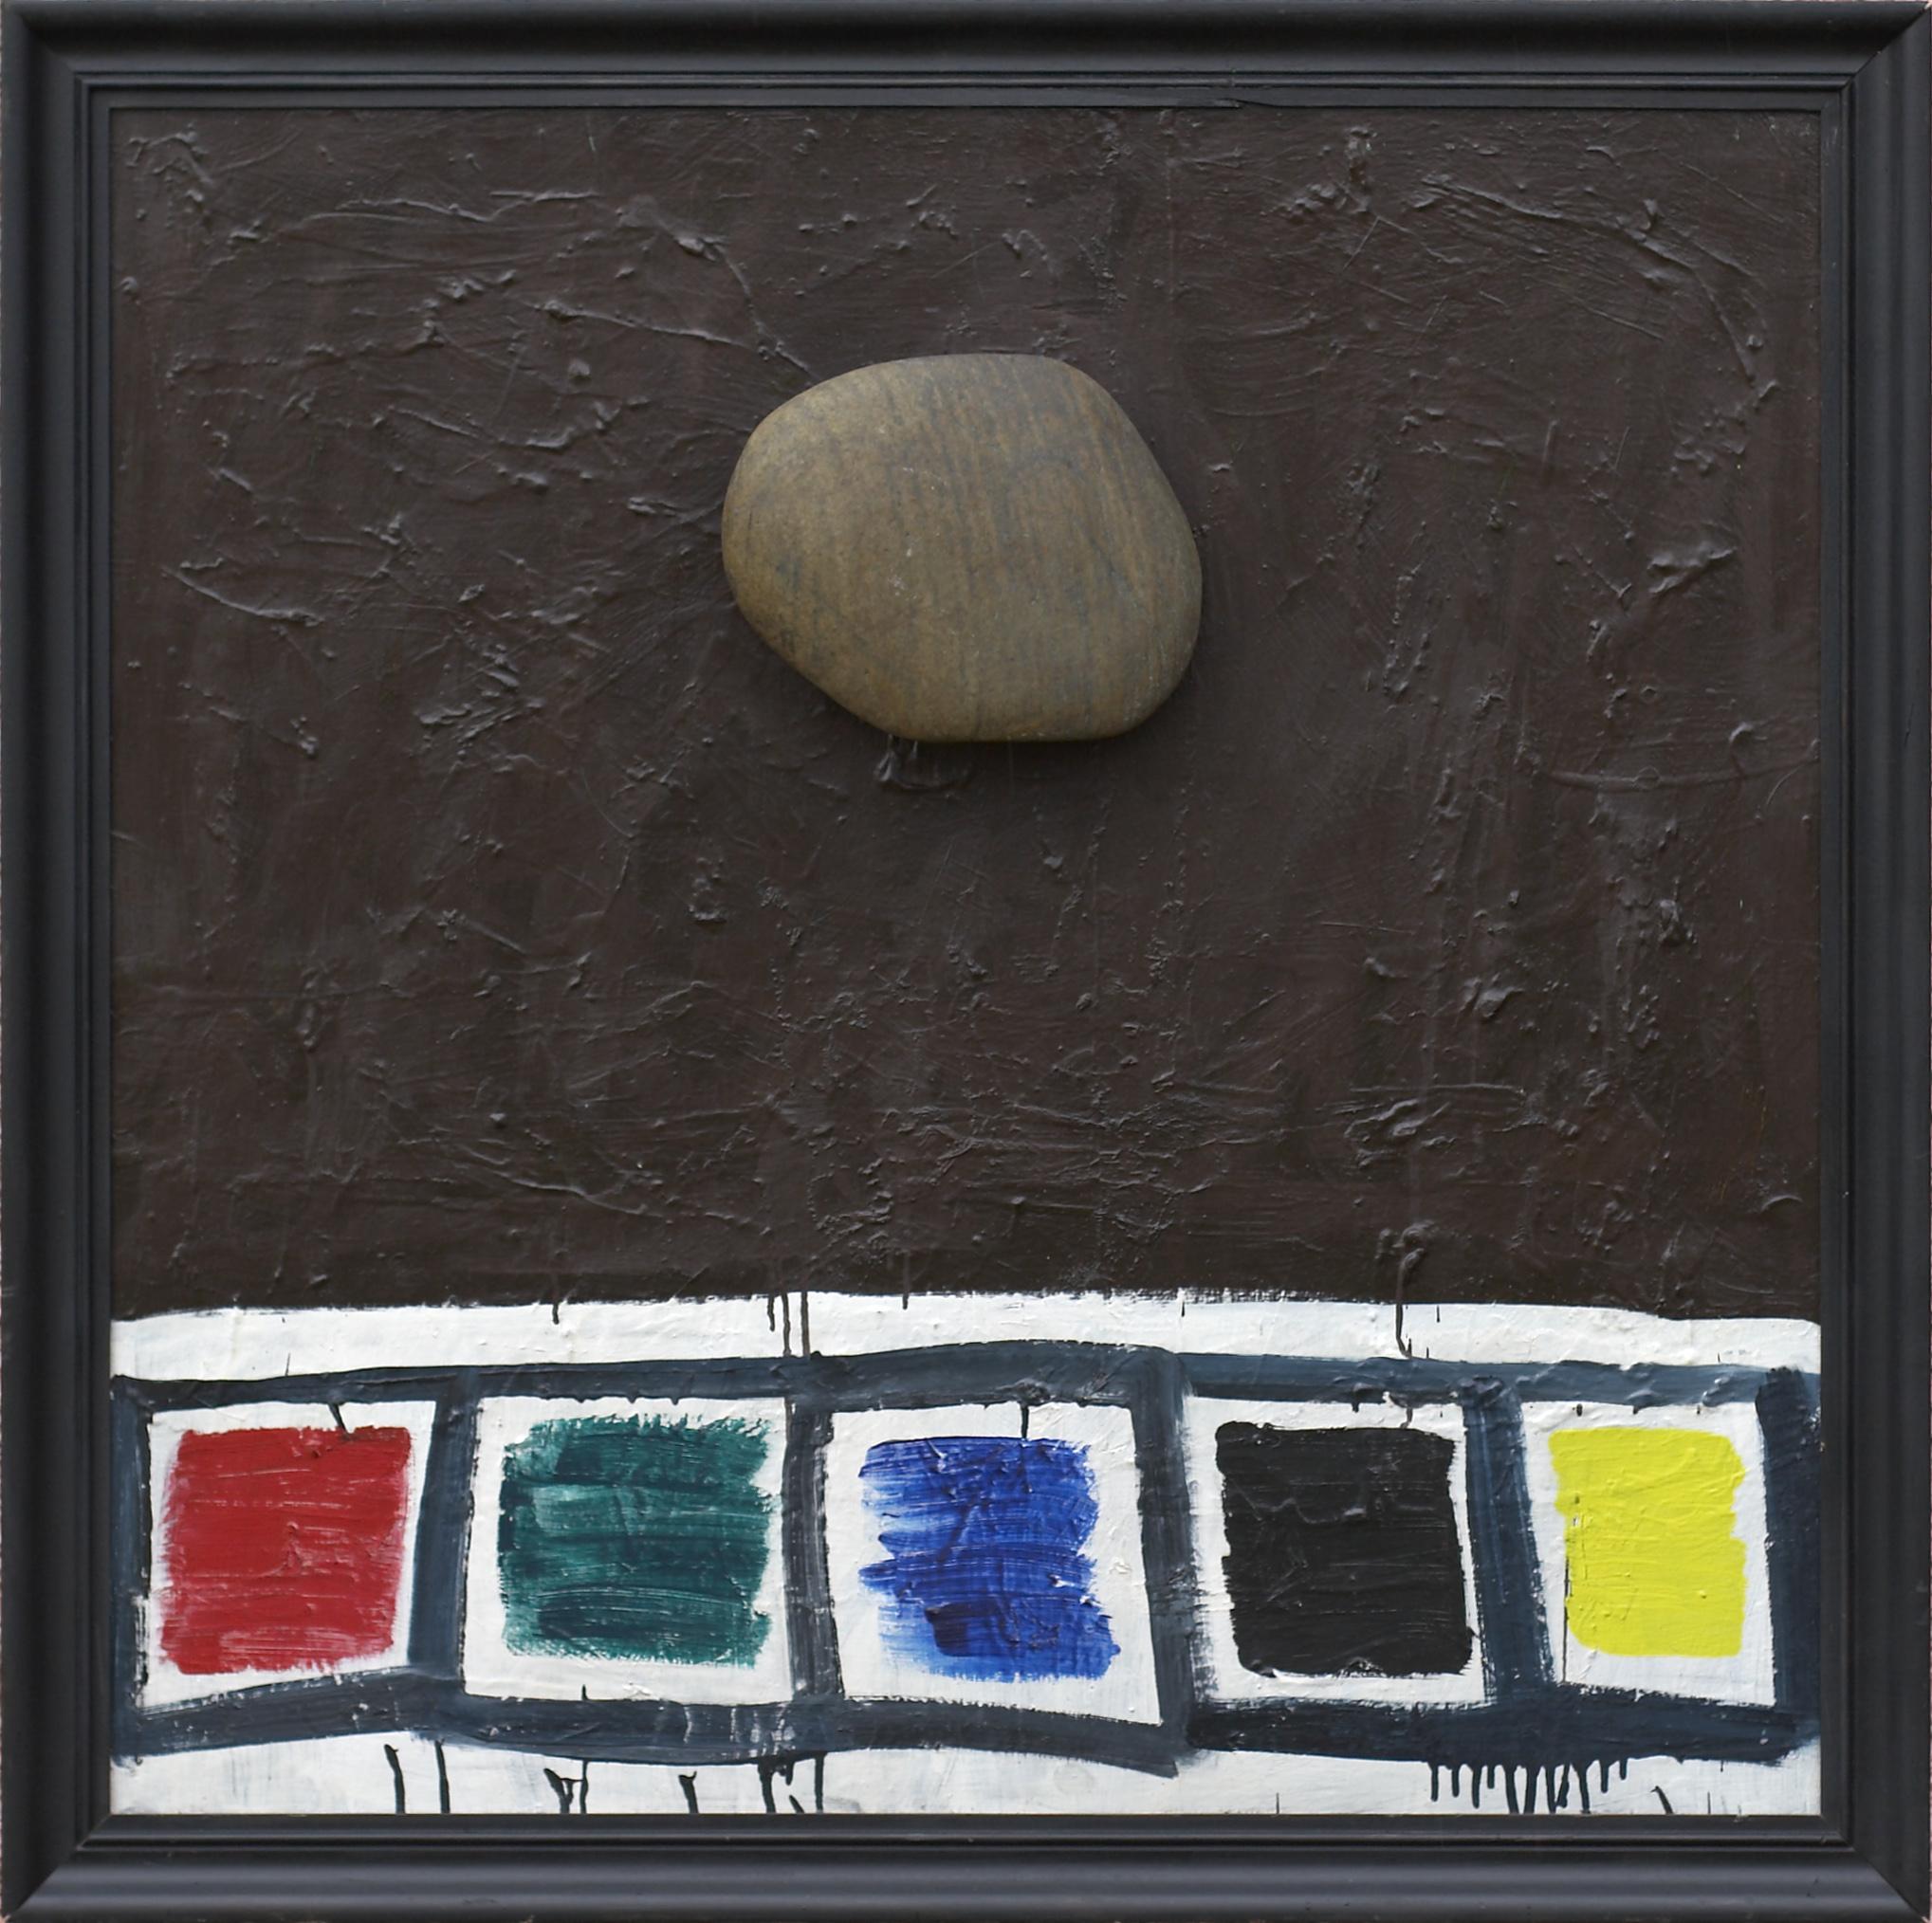 olje, les, kamen, 90 x 90 cm, 1991